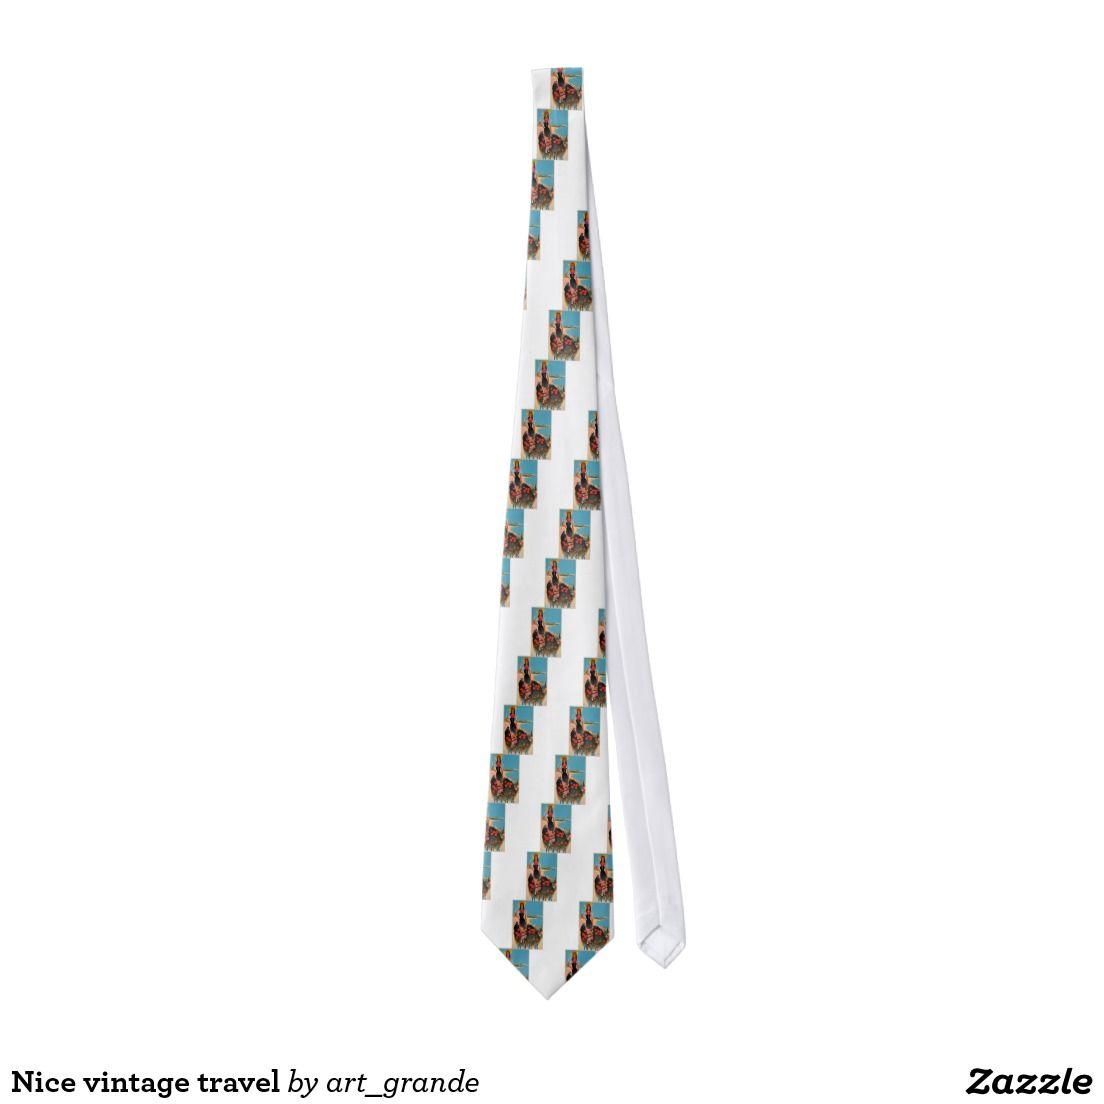 Nice vintage travel neck tie